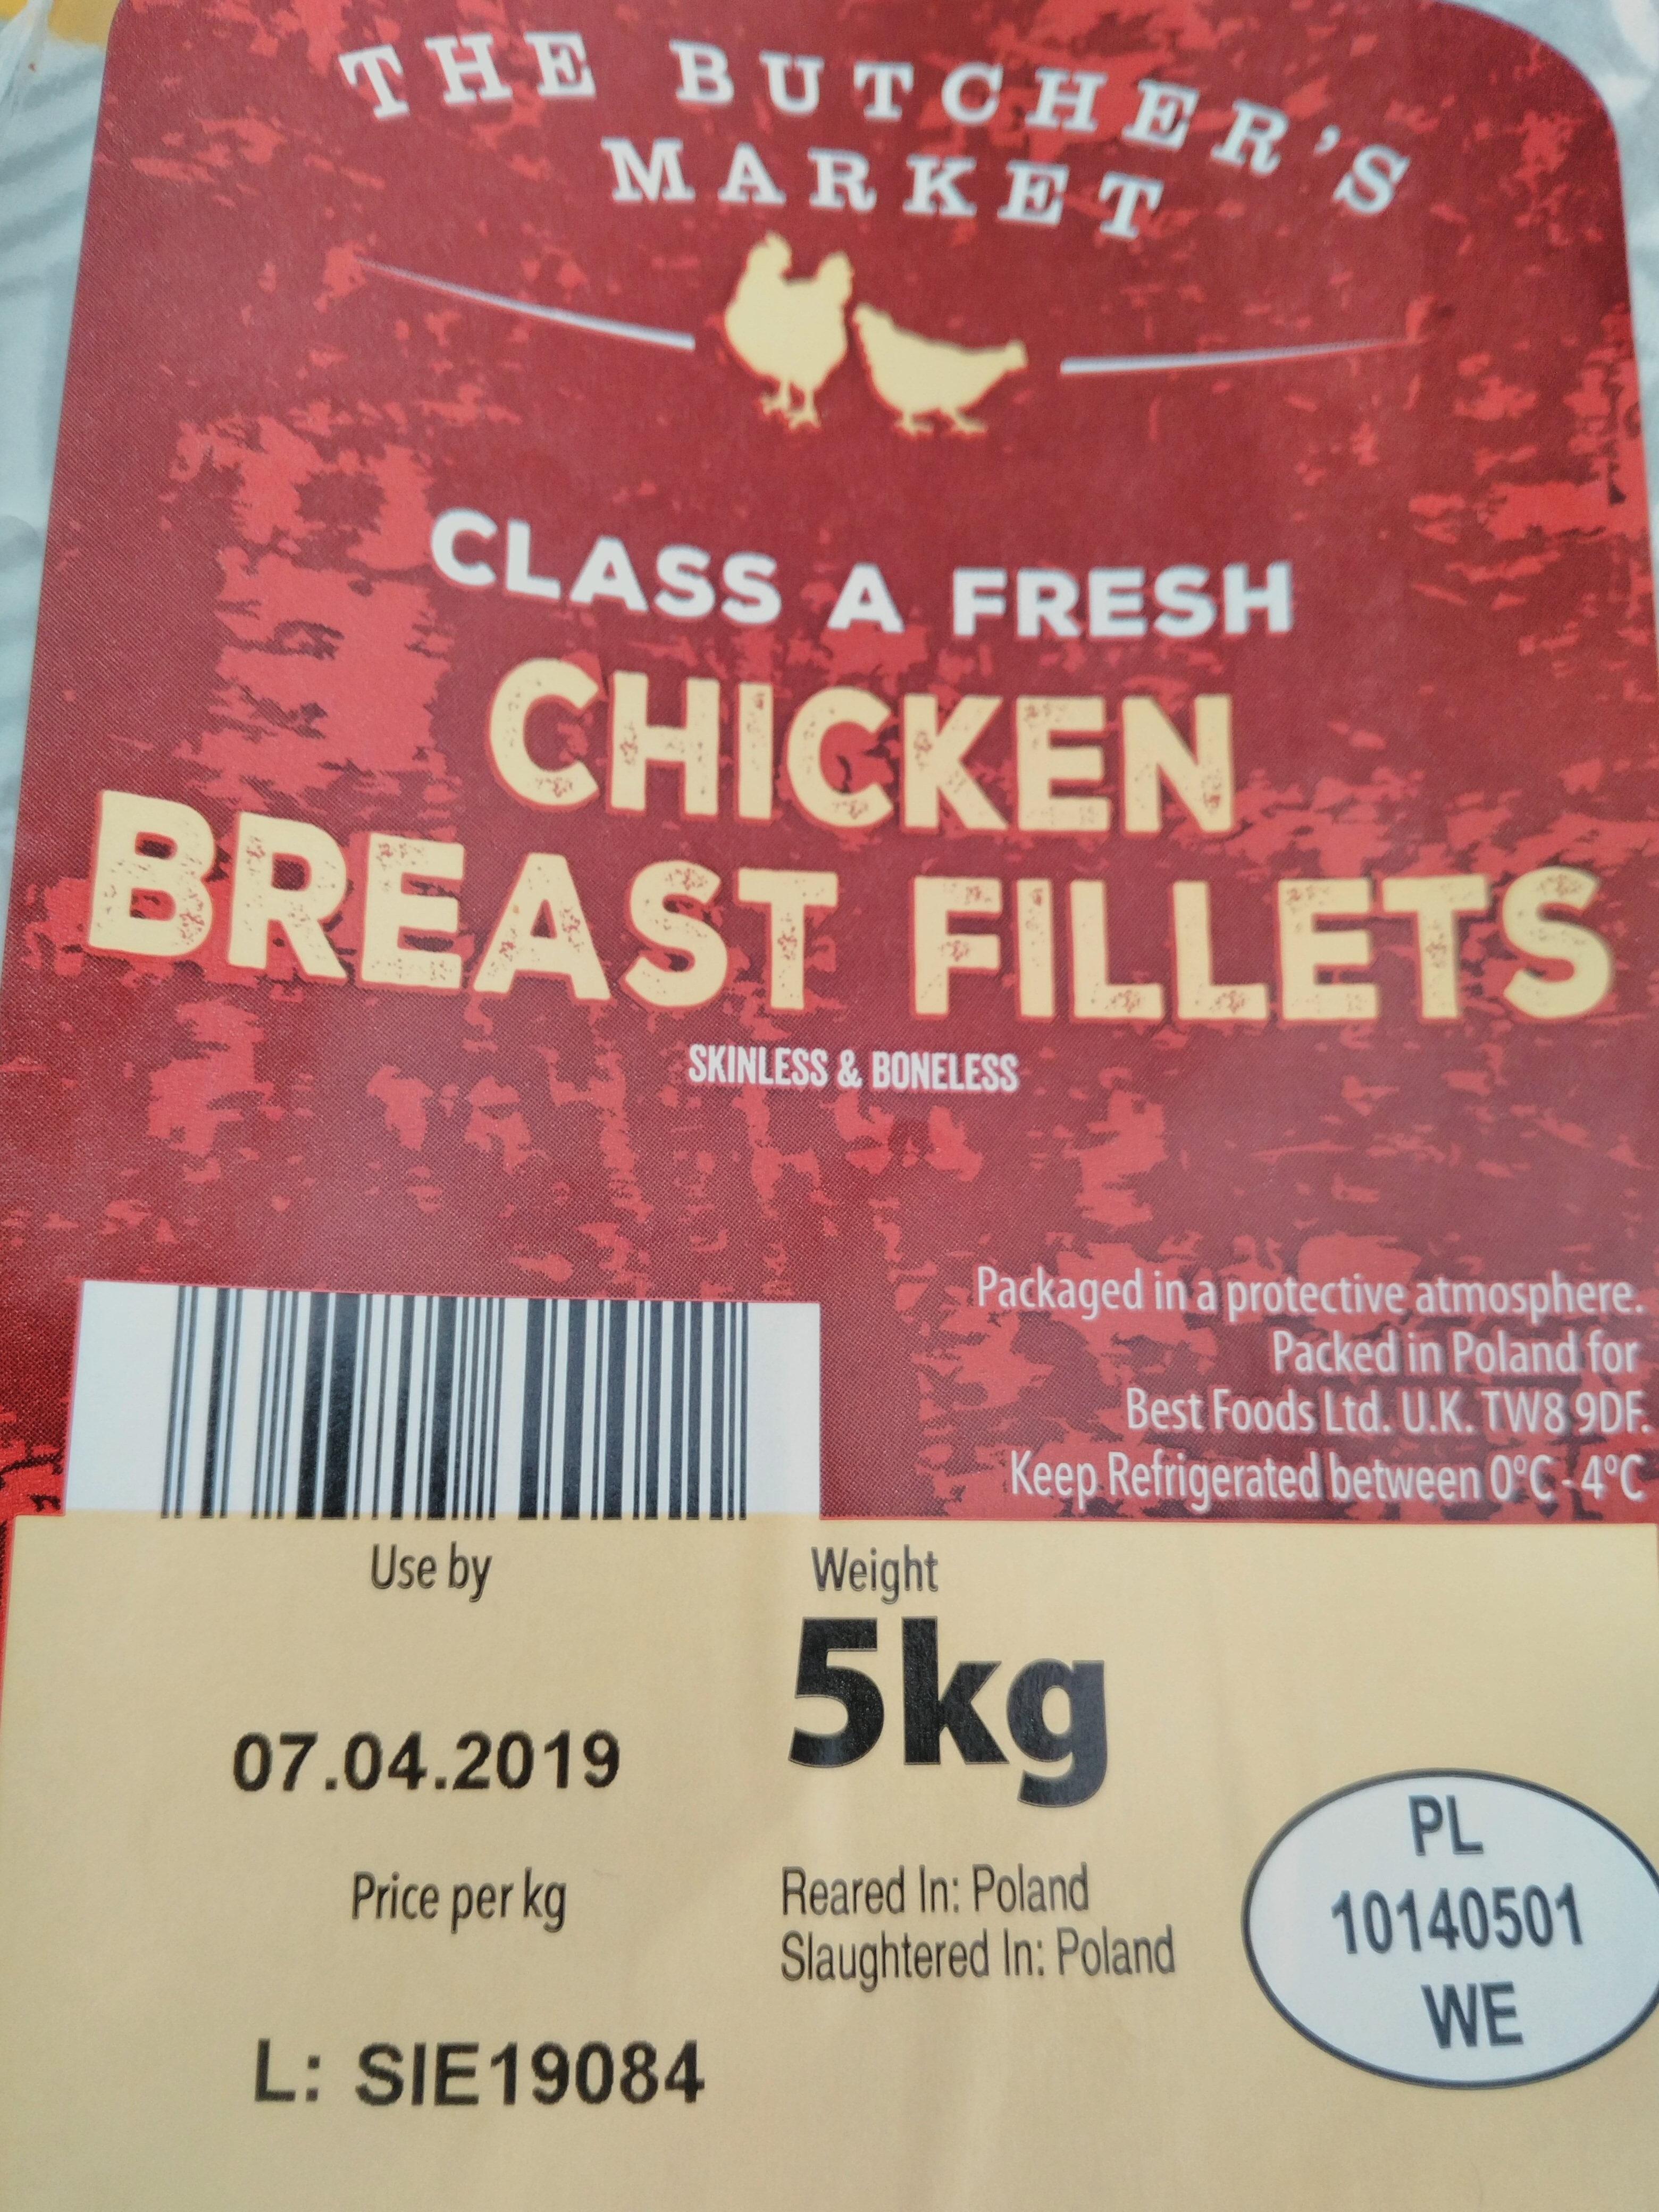 The Butcher's Market Class A Fresh Chicken Breast Fillets